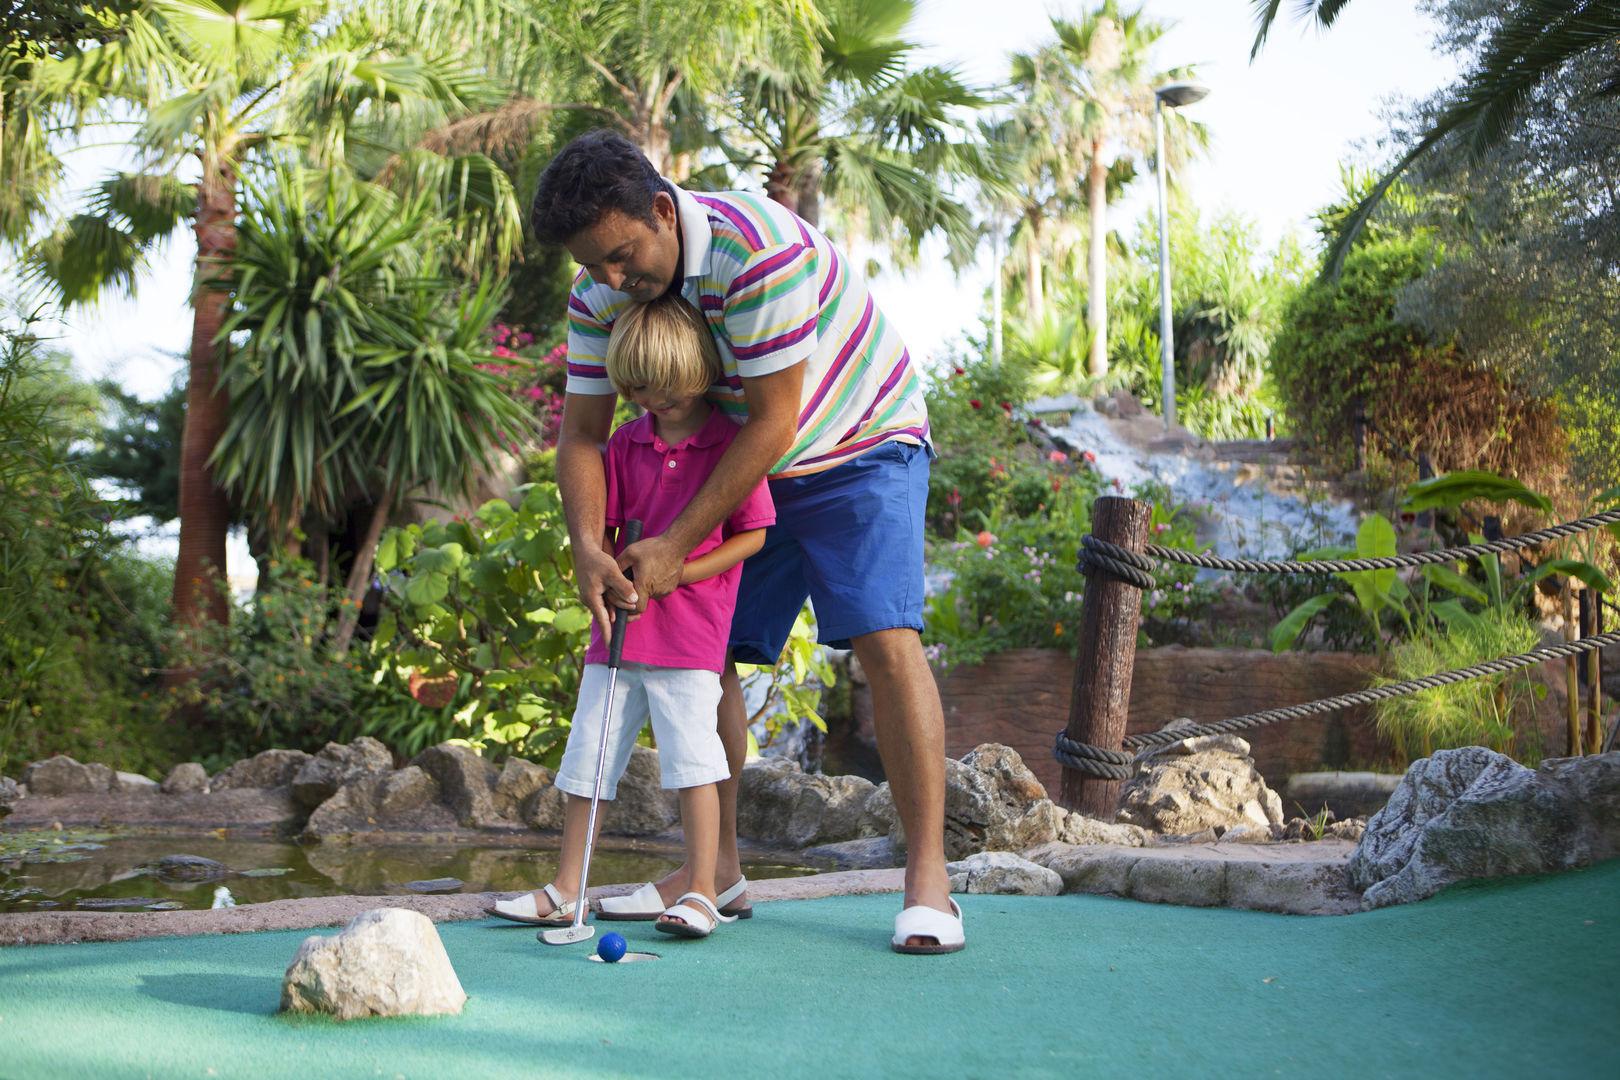 Playing in Golf Fantasia